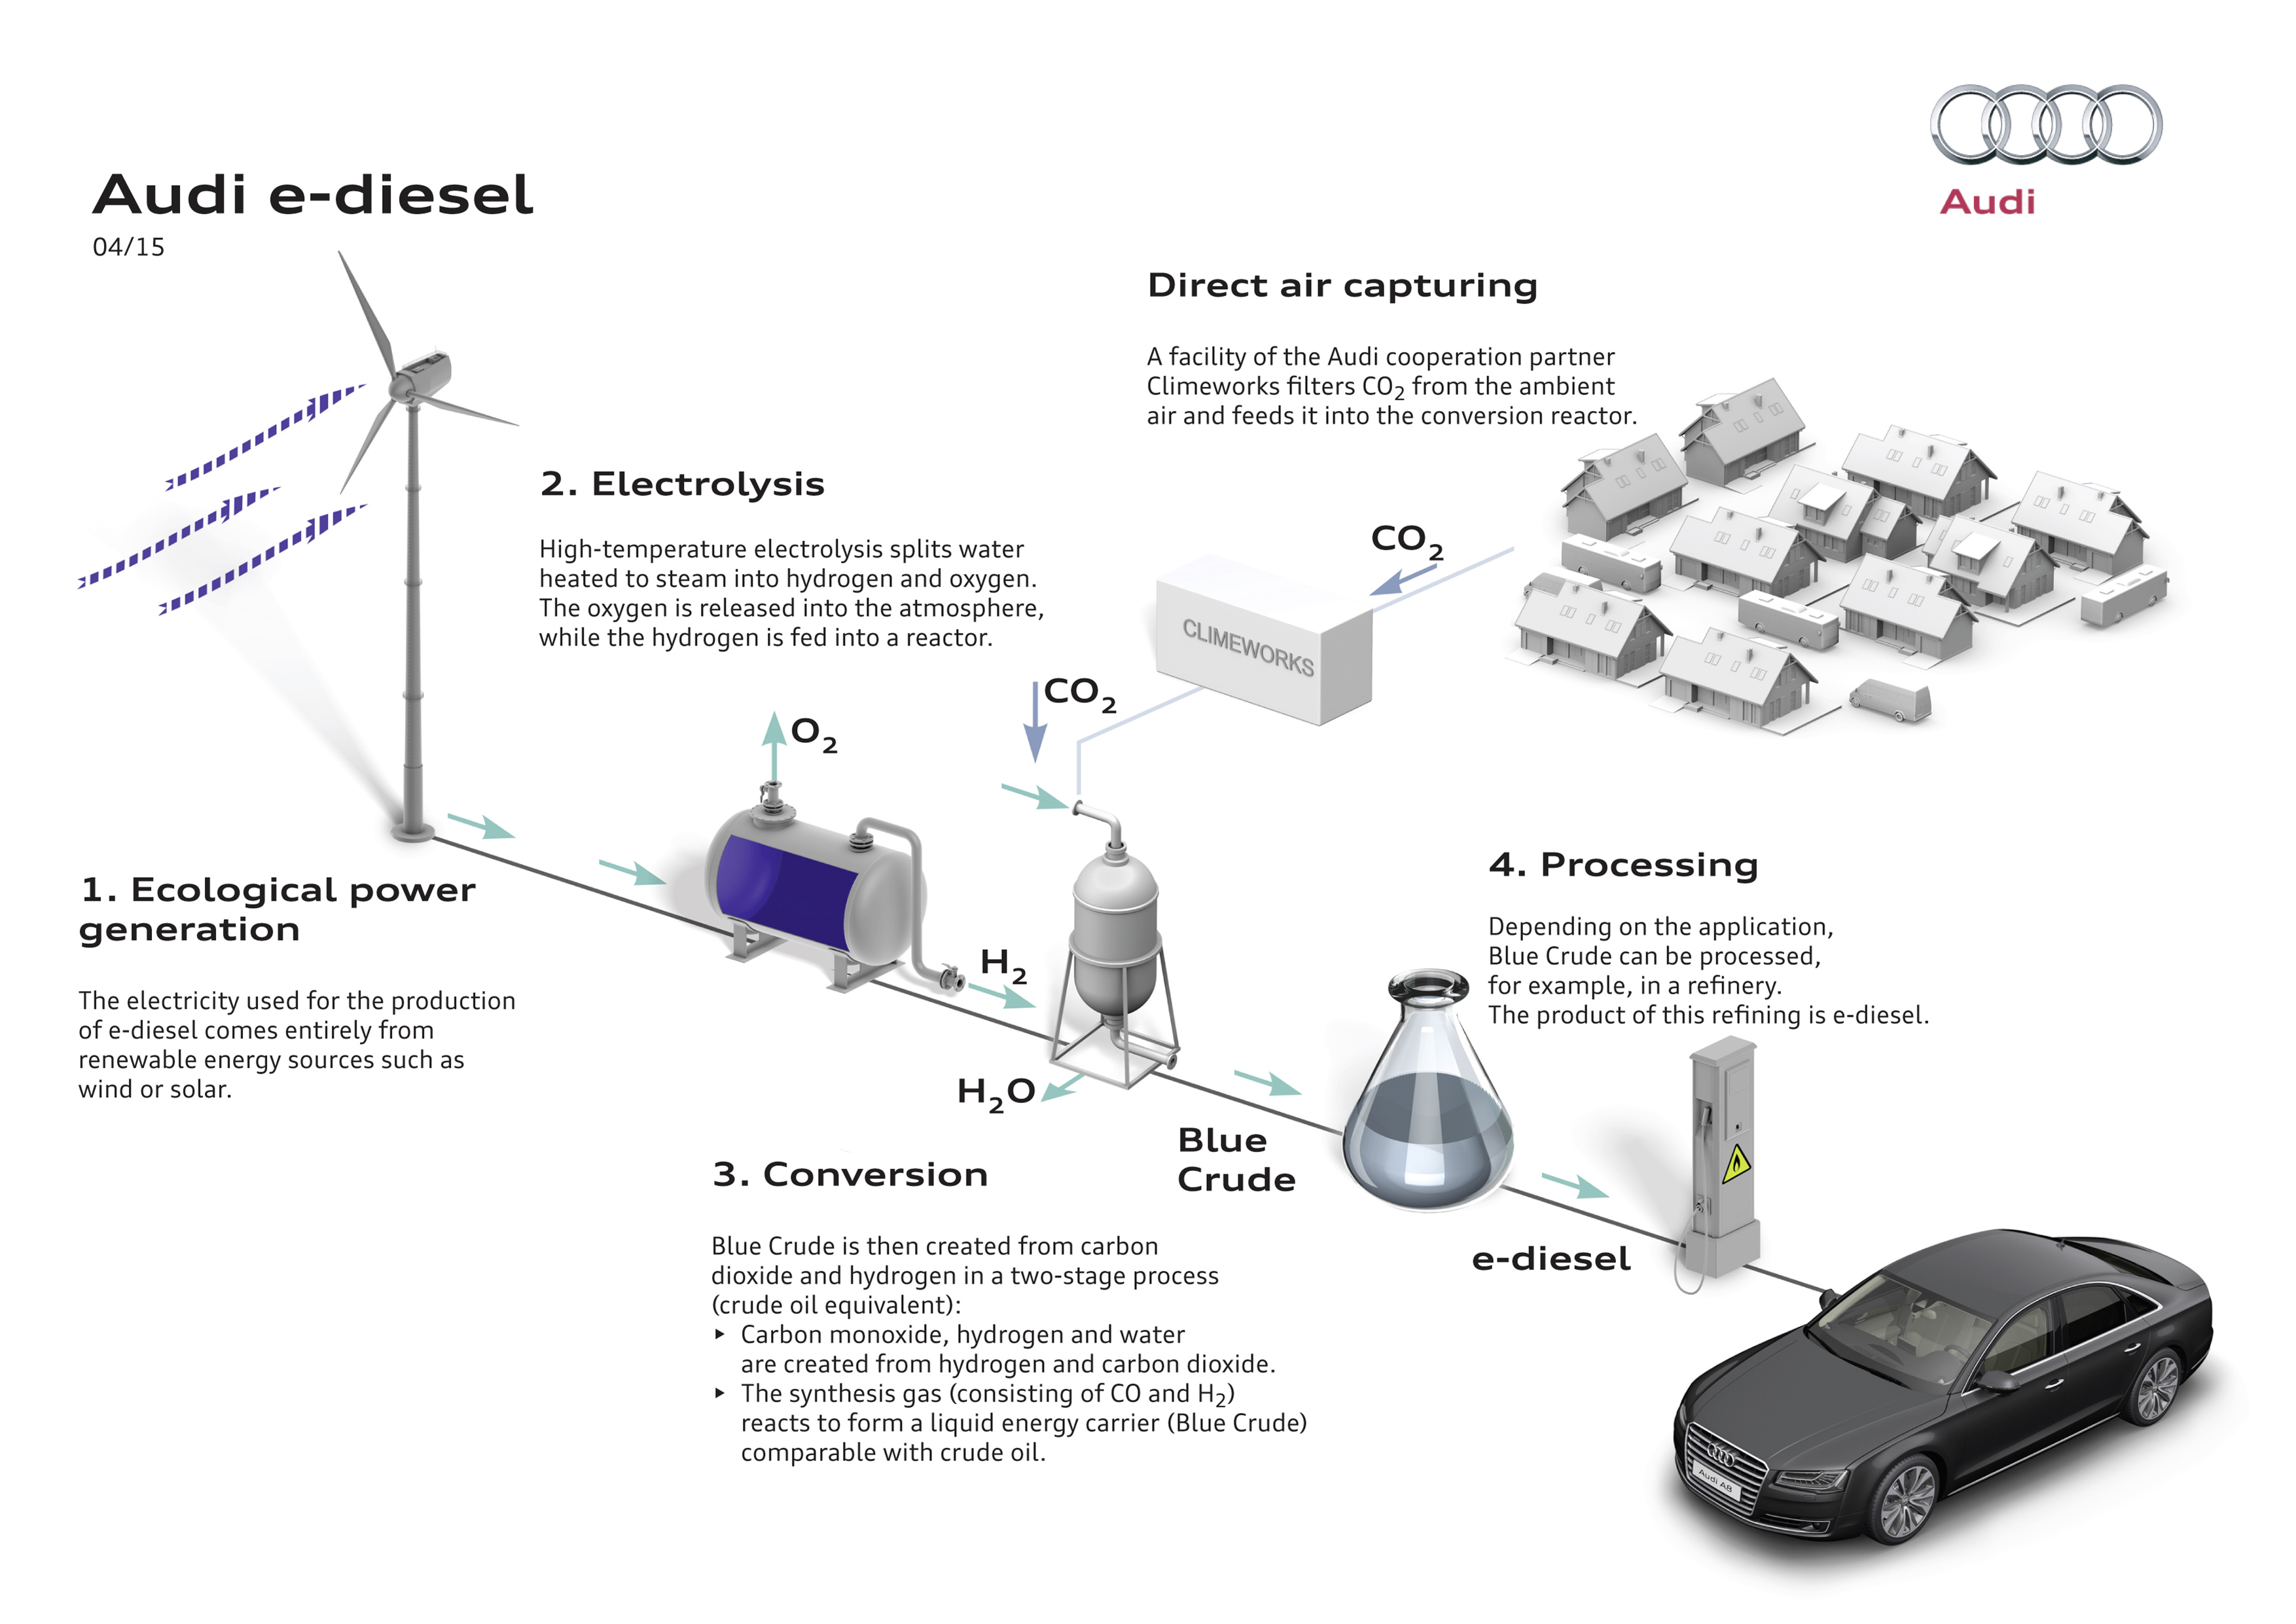 Audi e-diesel production process water co2 carbon dioxide